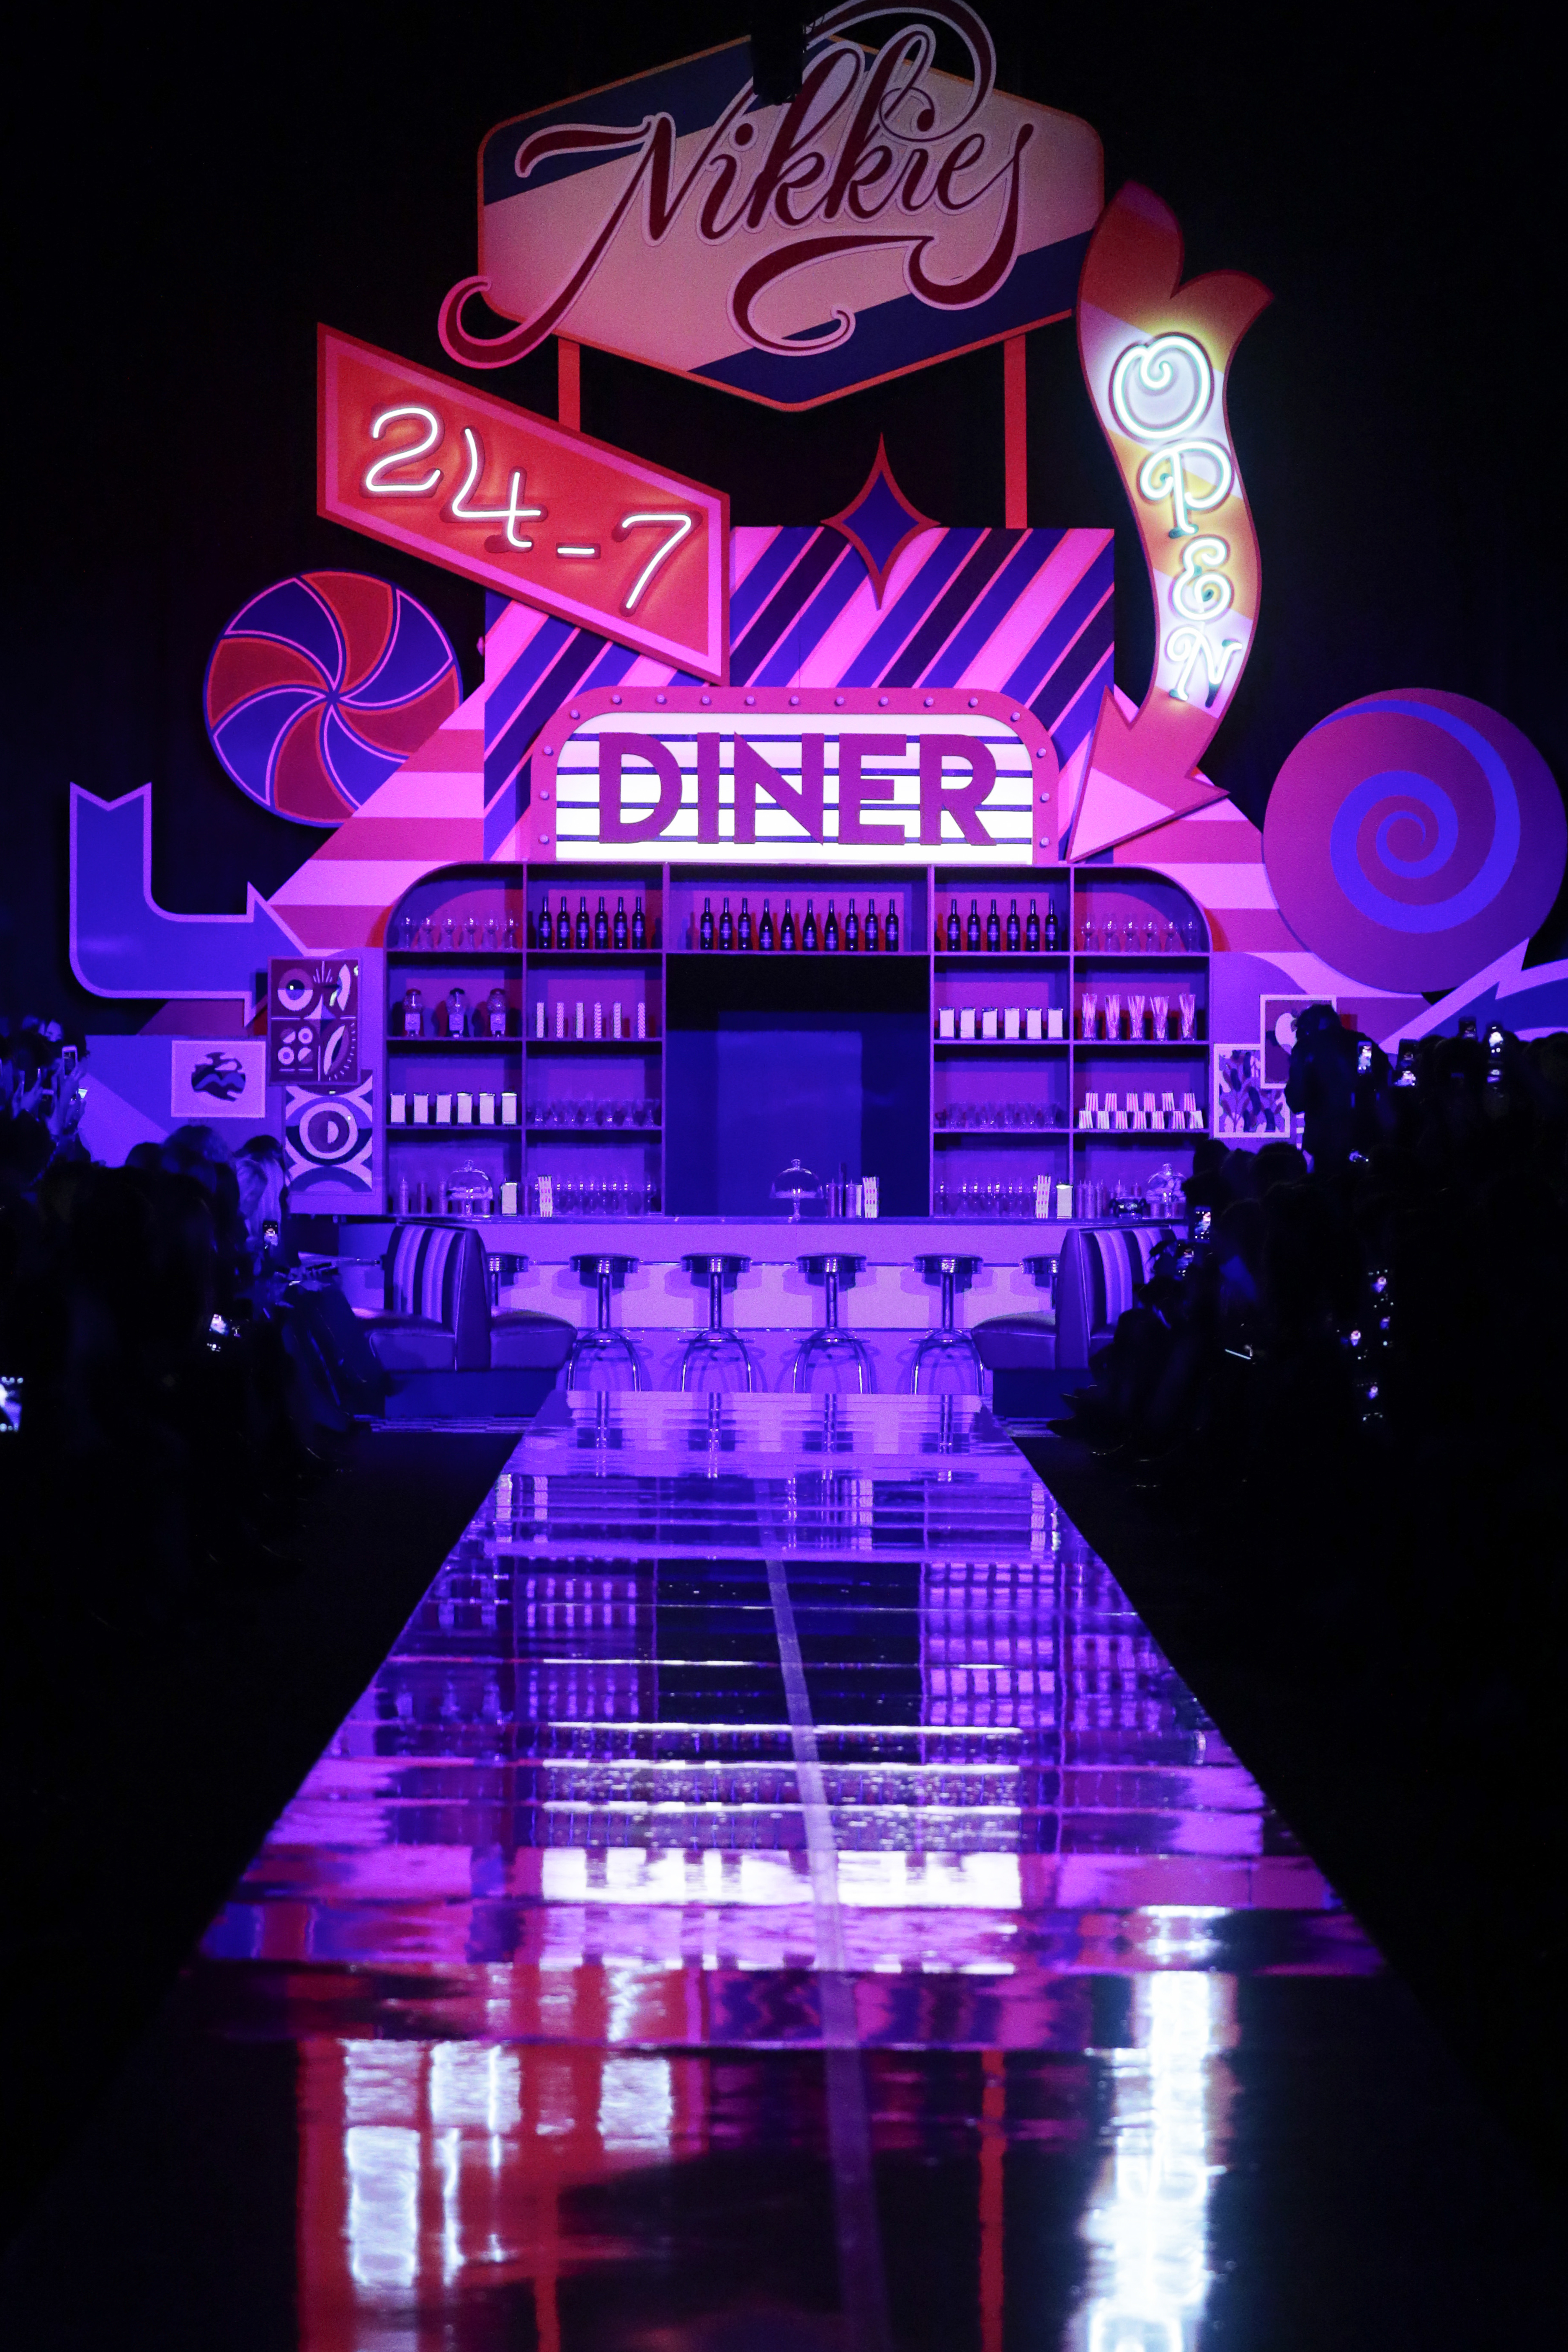 NIKKIE's diner decor